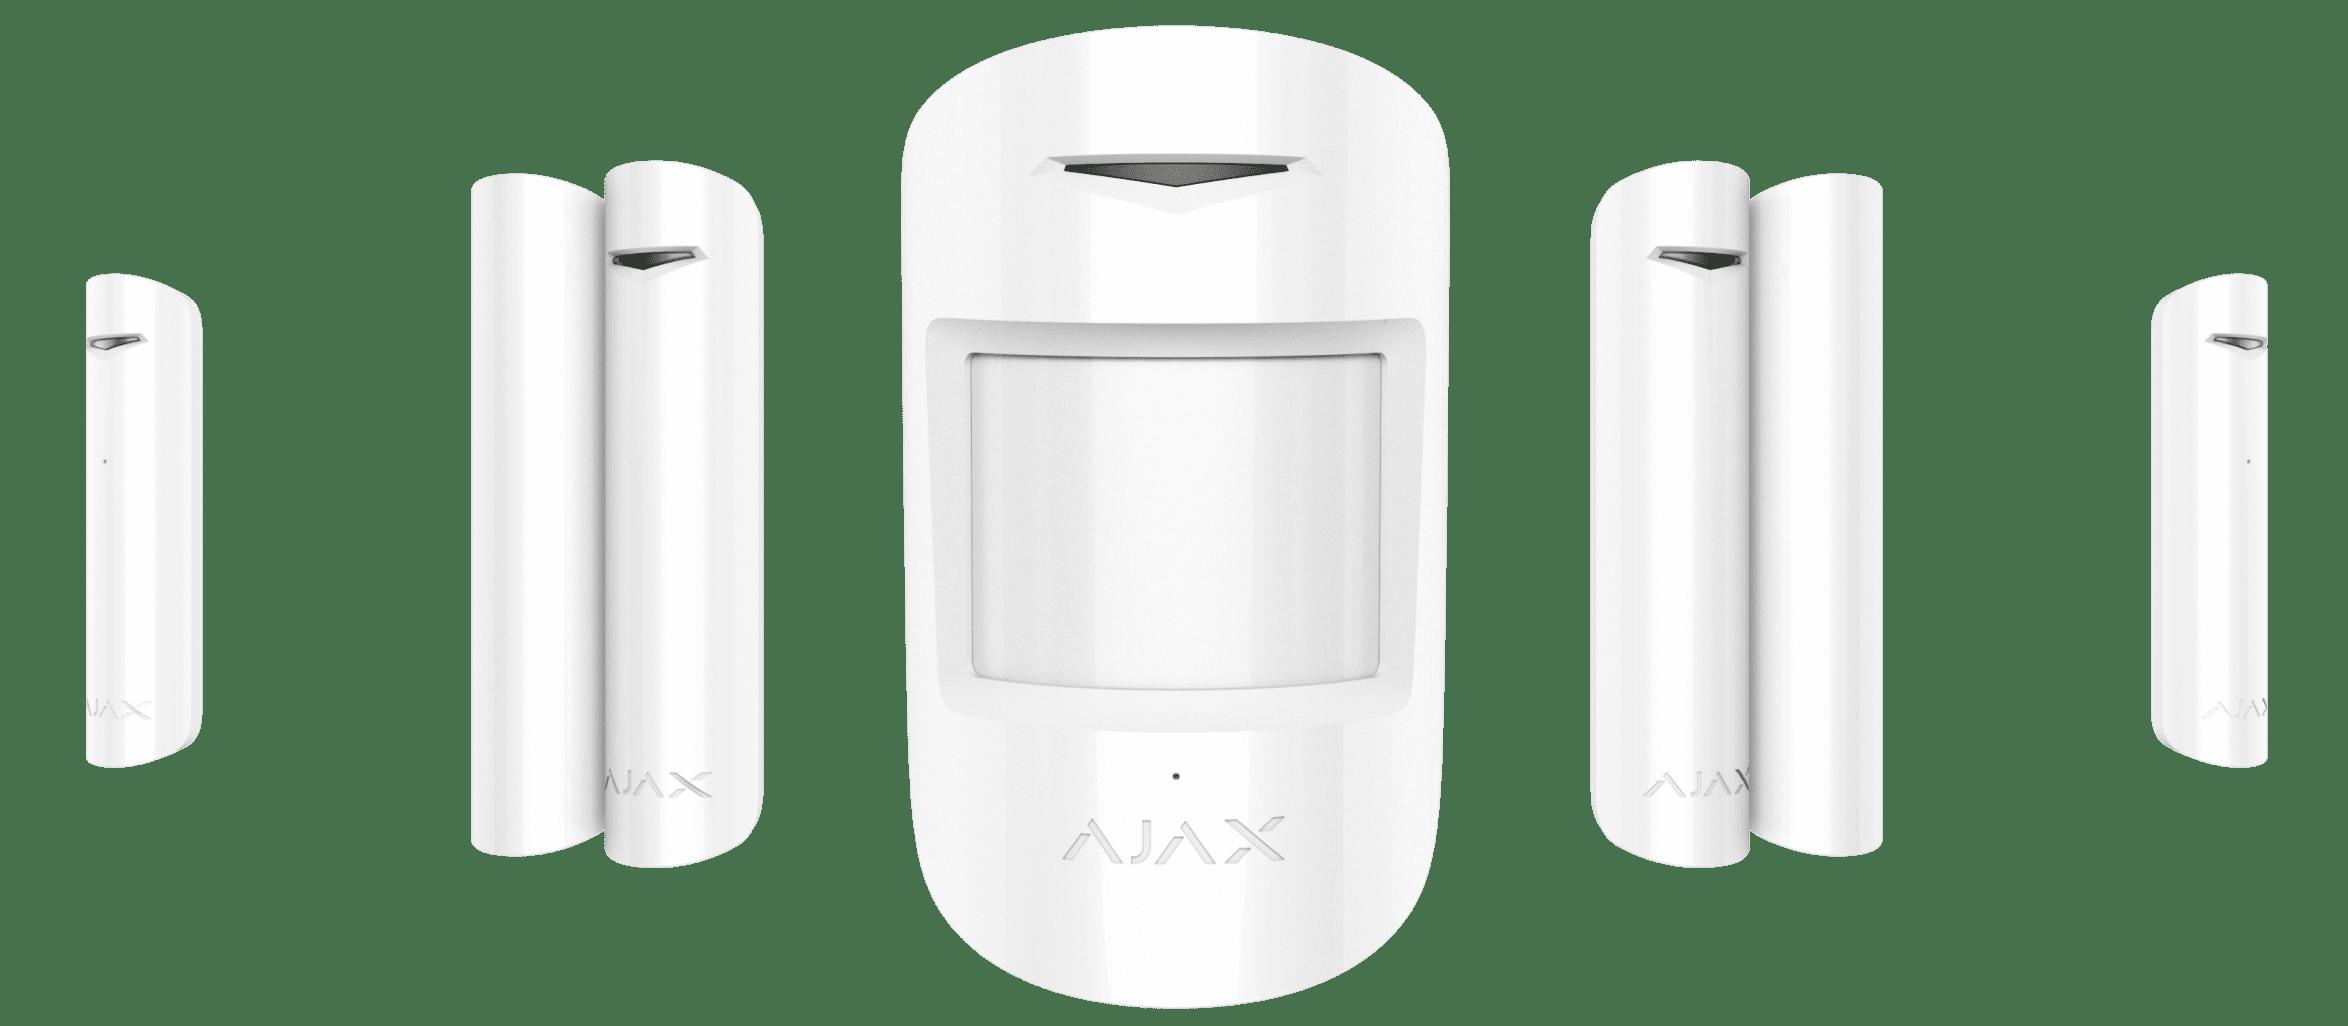 Комплект сигнализации в квартиру Ajax